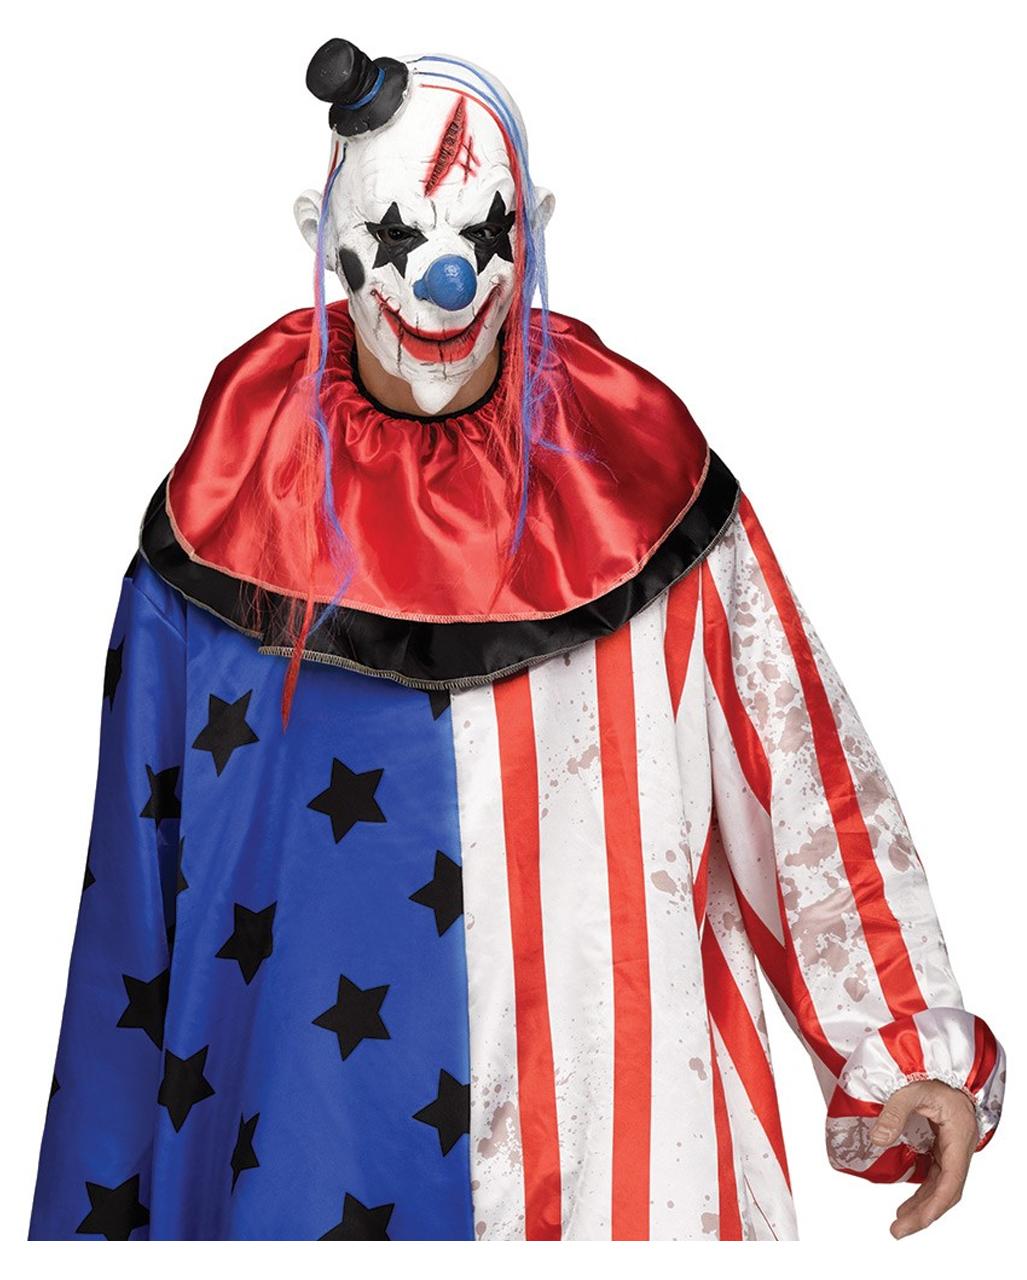 Halloween Kostume Amerika.Amerika Clown Kostum Mit Maske